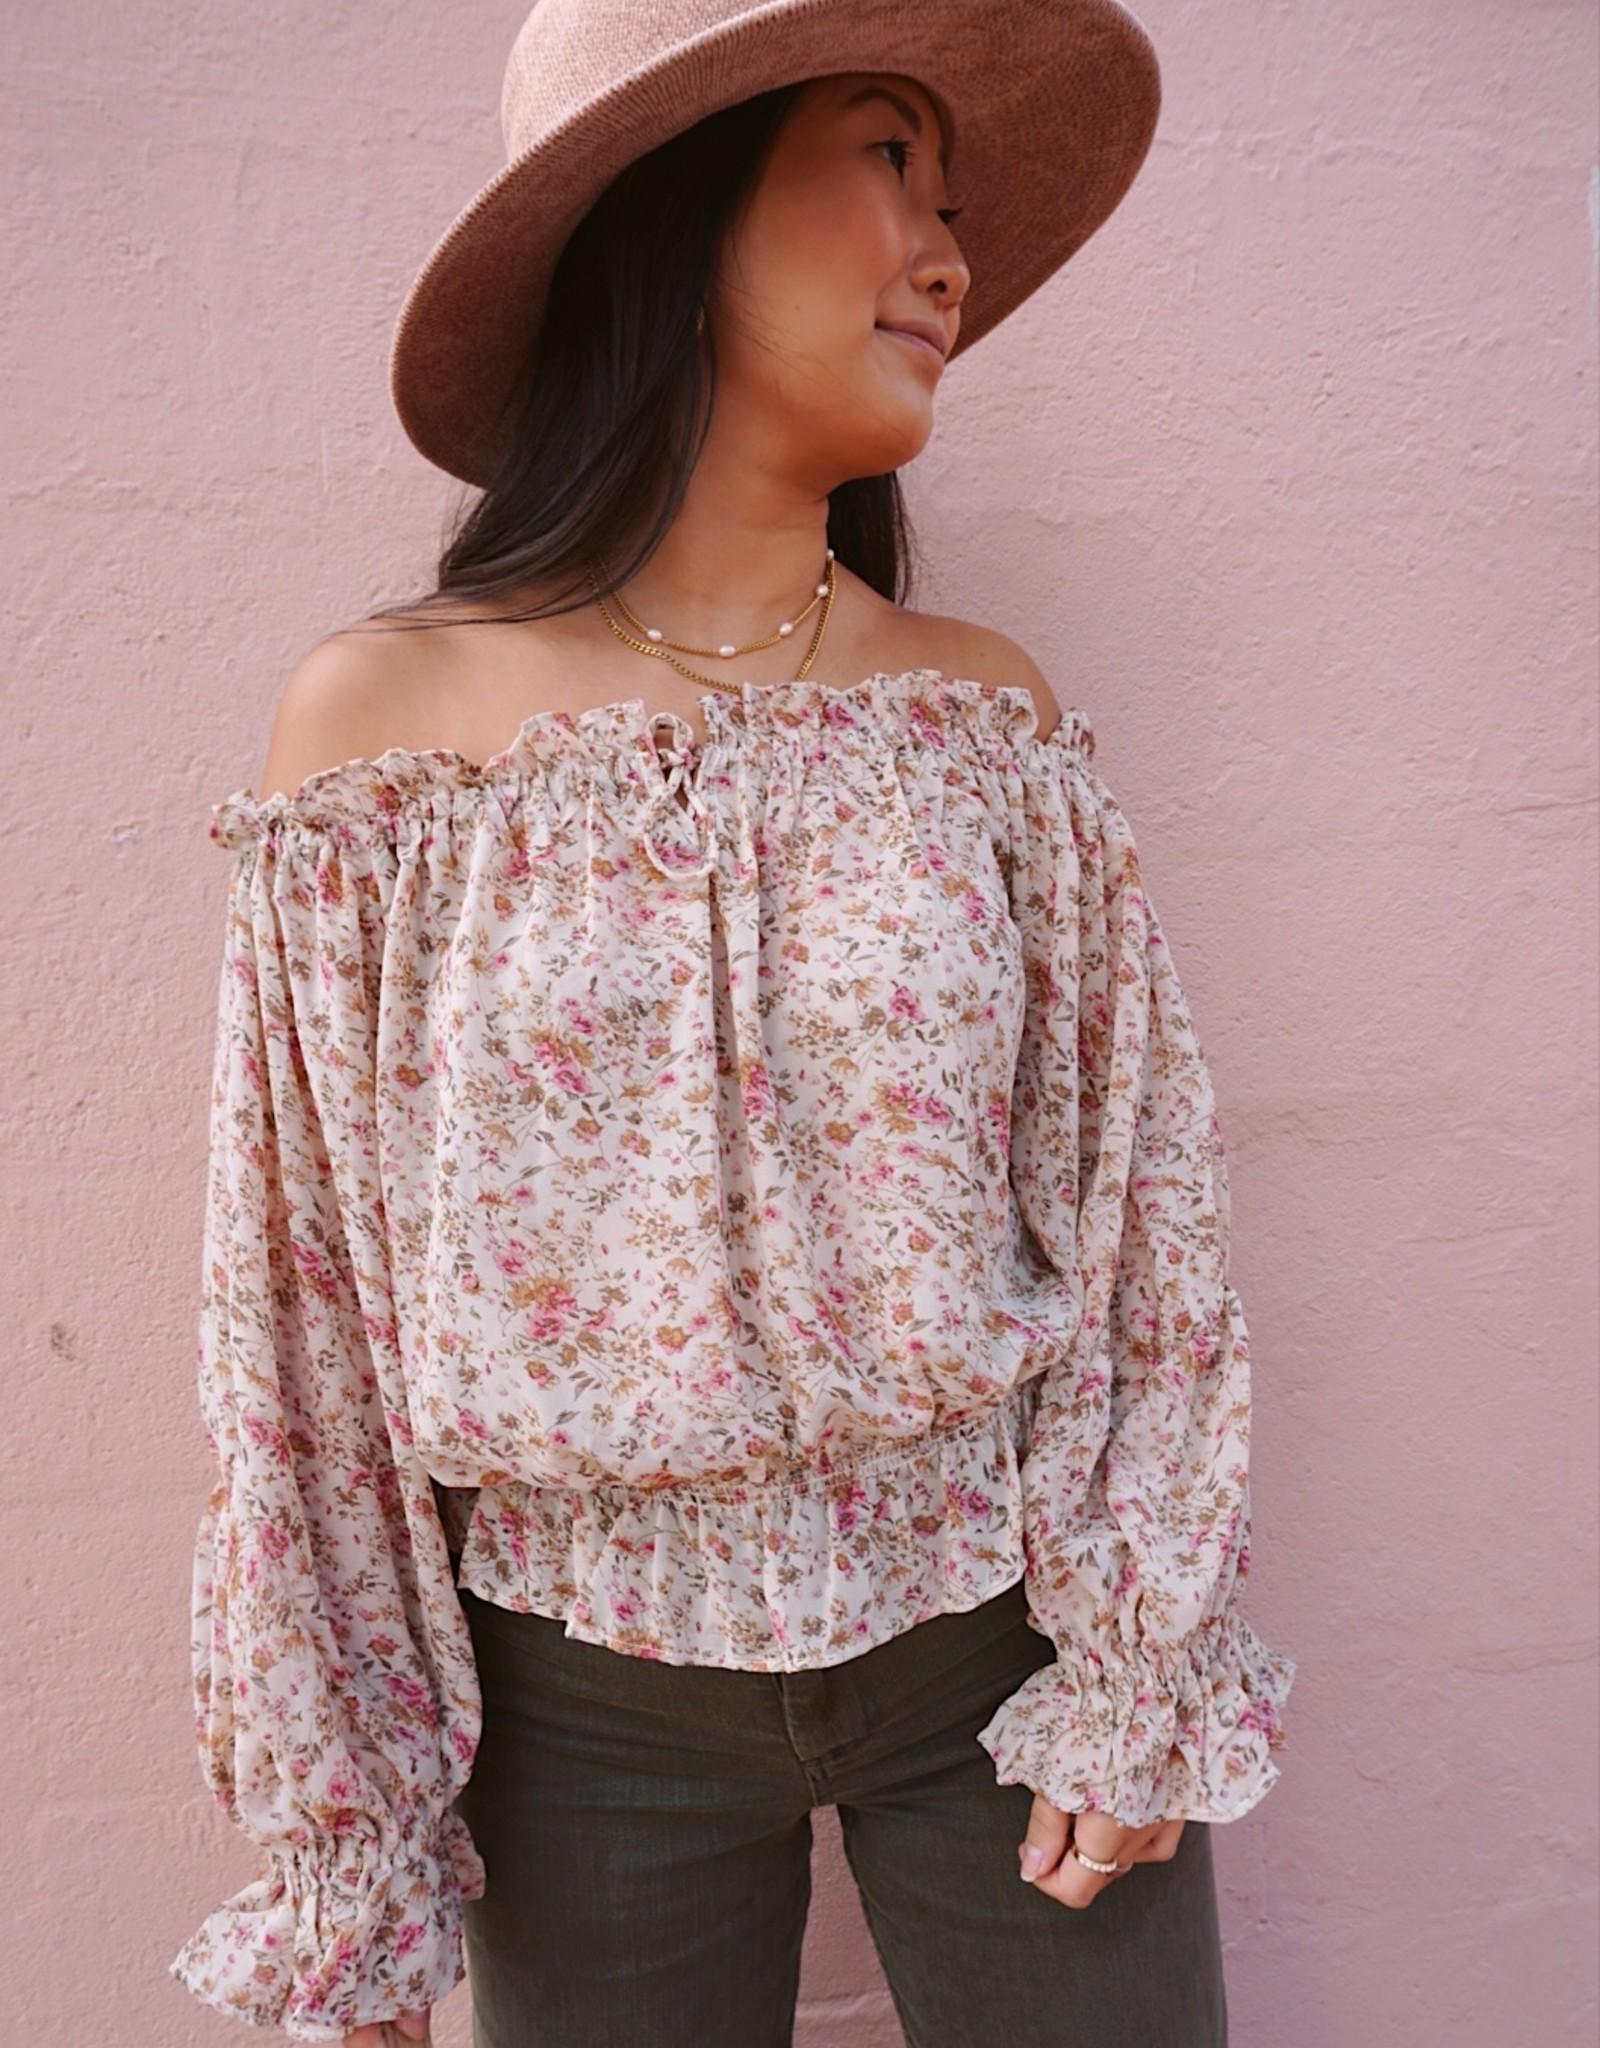 Zaria Floral Blouse